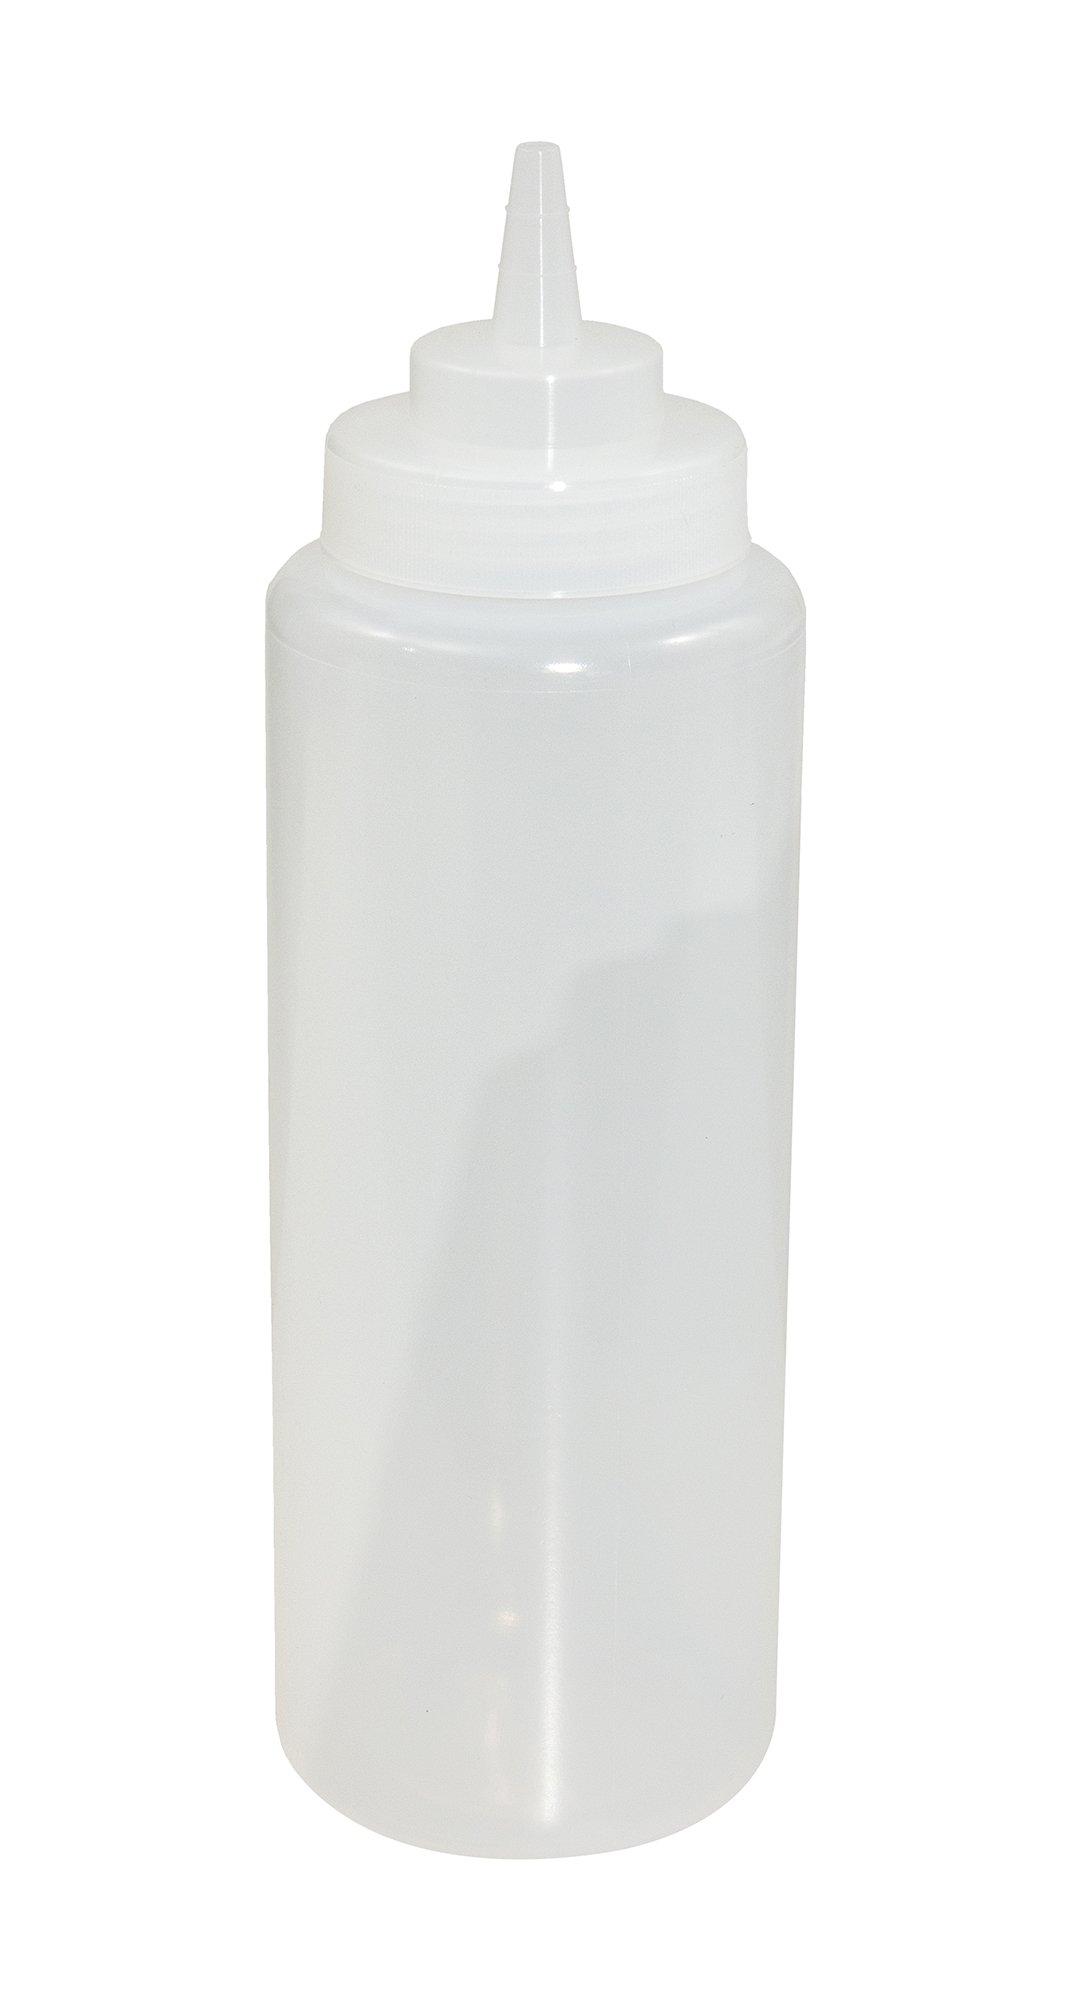 Crestware SB32CW (1 dz.) Squeeze Wide Mouth Bottle (1 Dozen), 32 oz, Clear by CRESTWARE